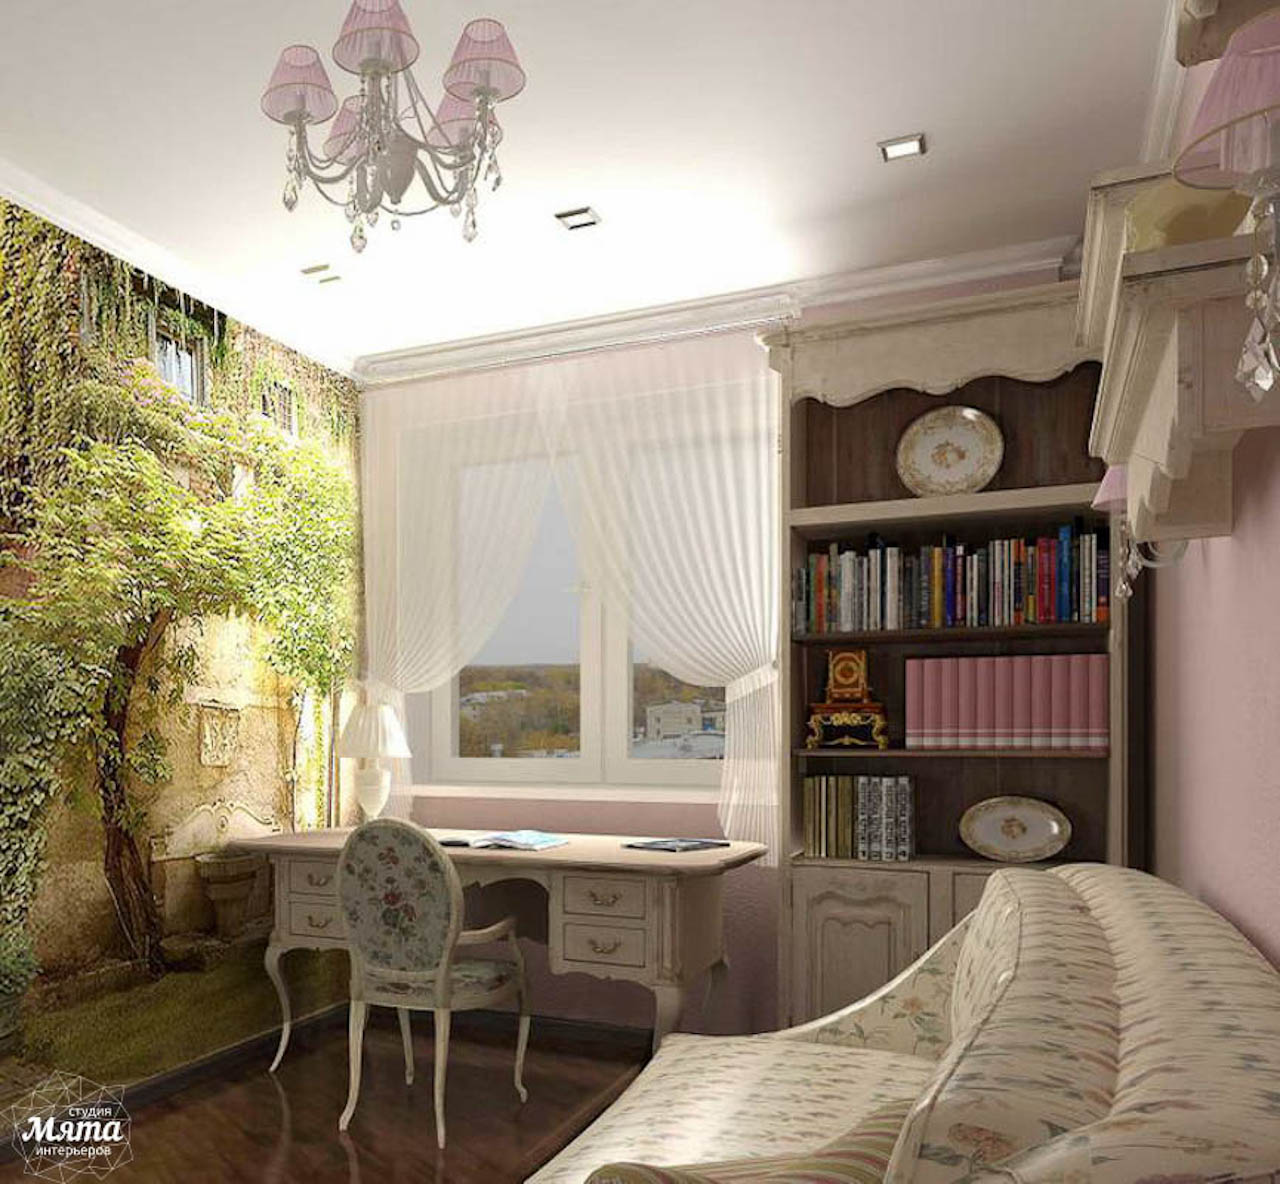 Дизайн интерьера двухкомнатной квартиры по ул. Юмашева 10 img1348194821